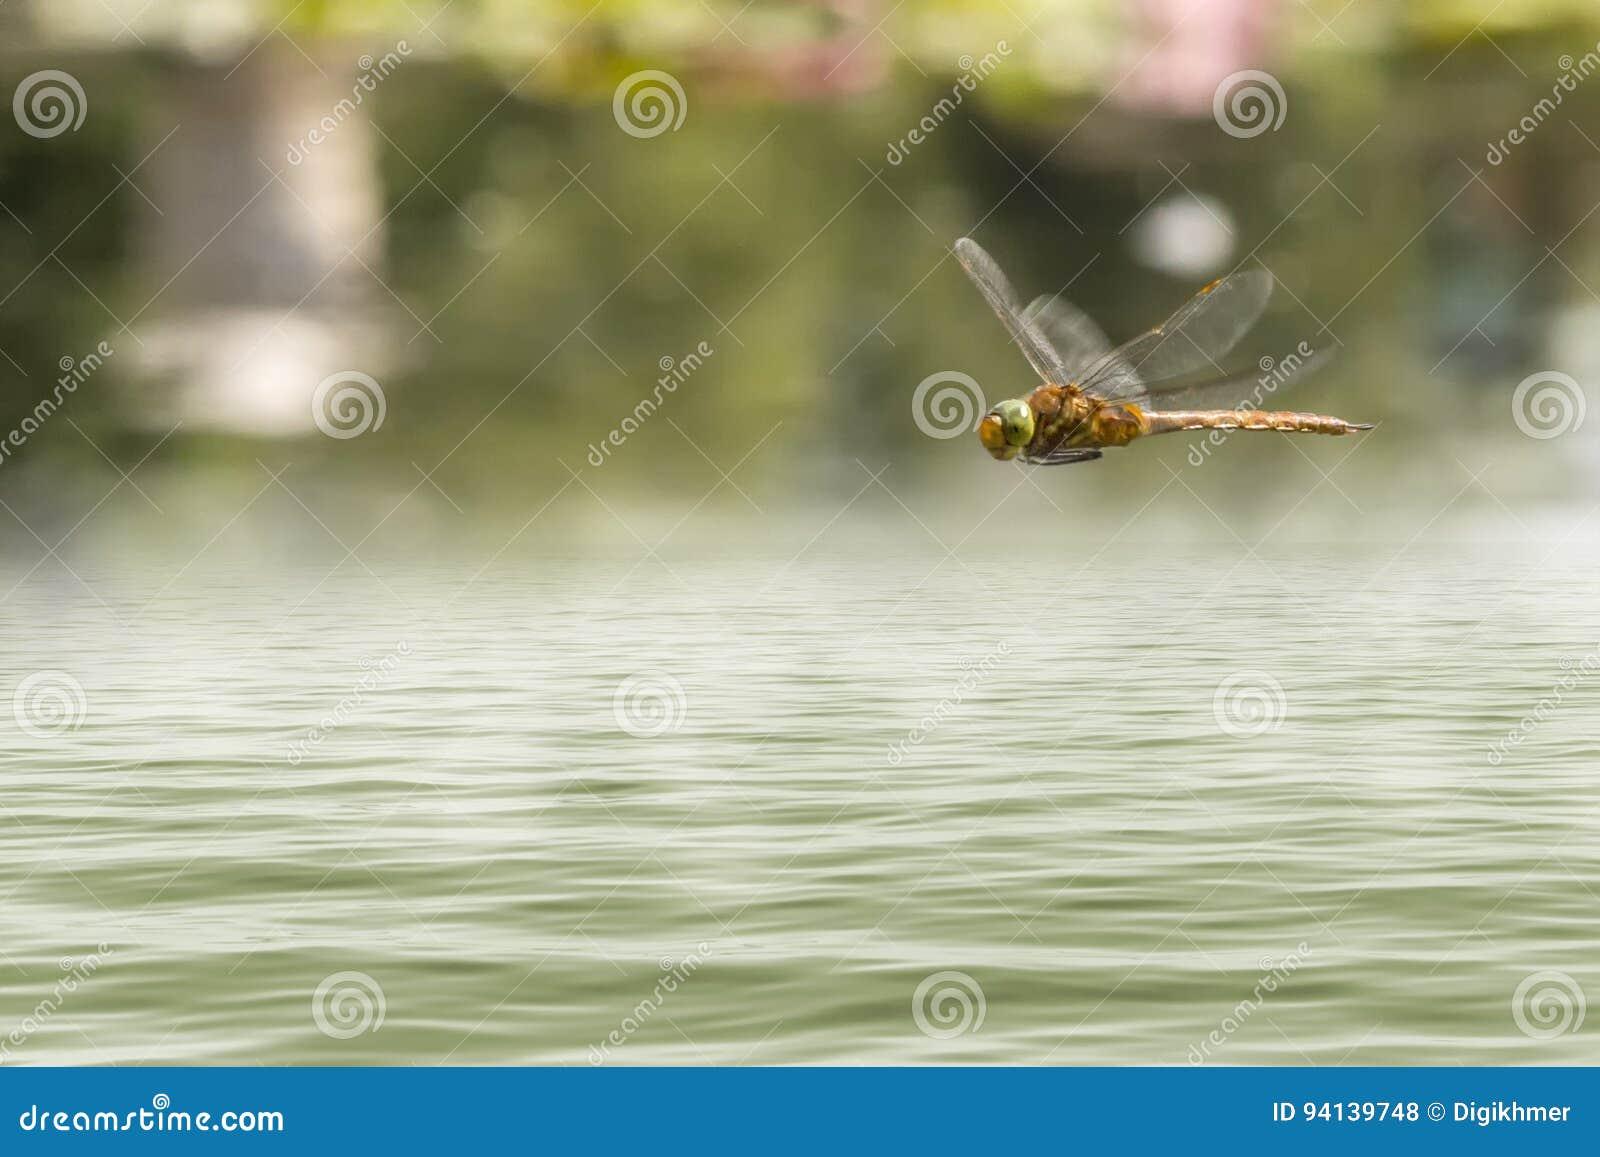 Dragonfly flying in a Zen garden